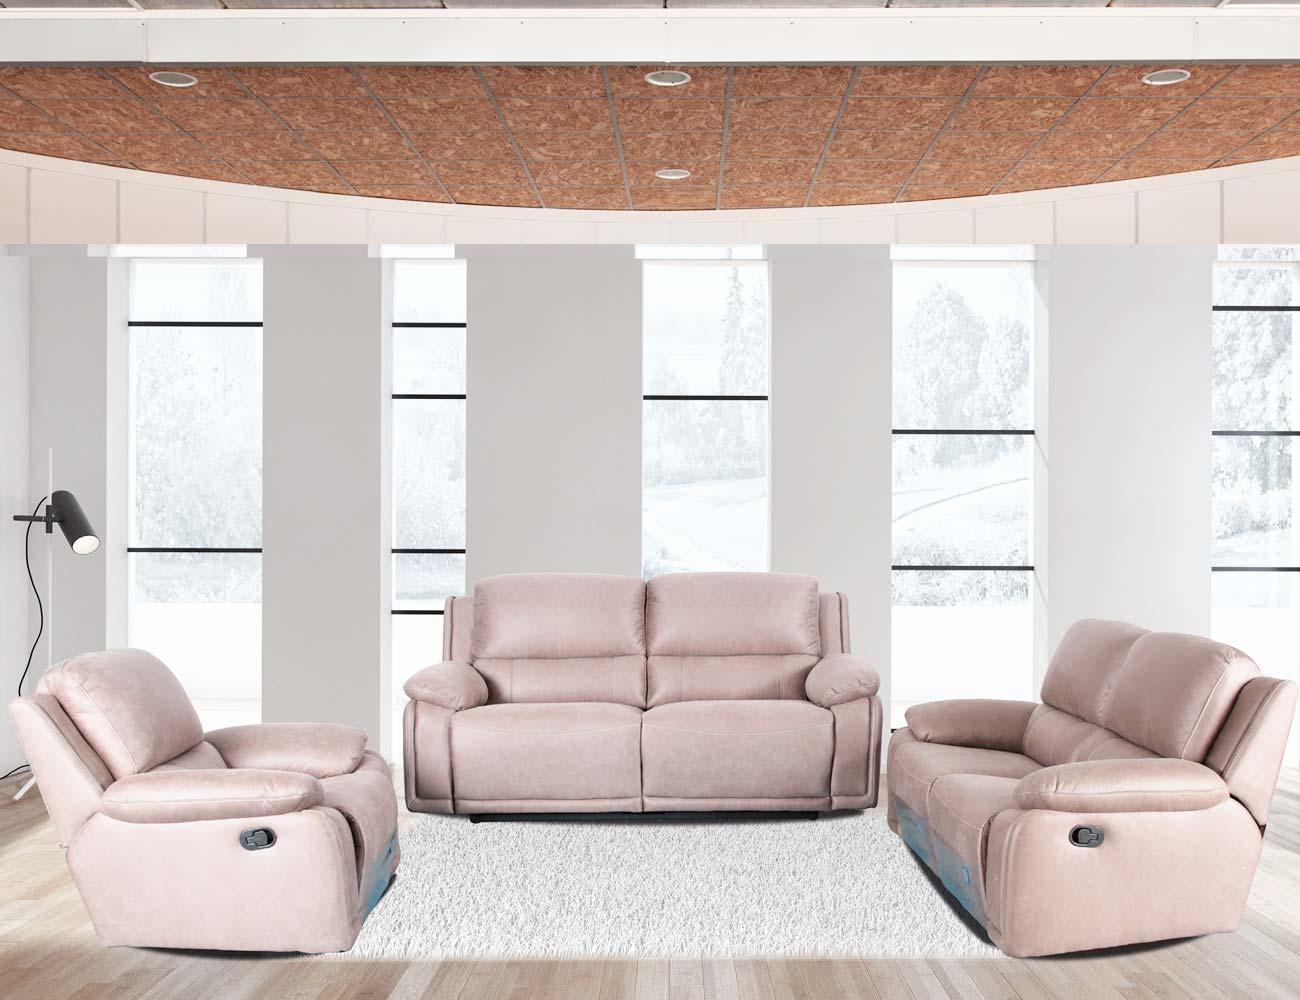 Conjunto sofa 3 2 1 plazas relax arena